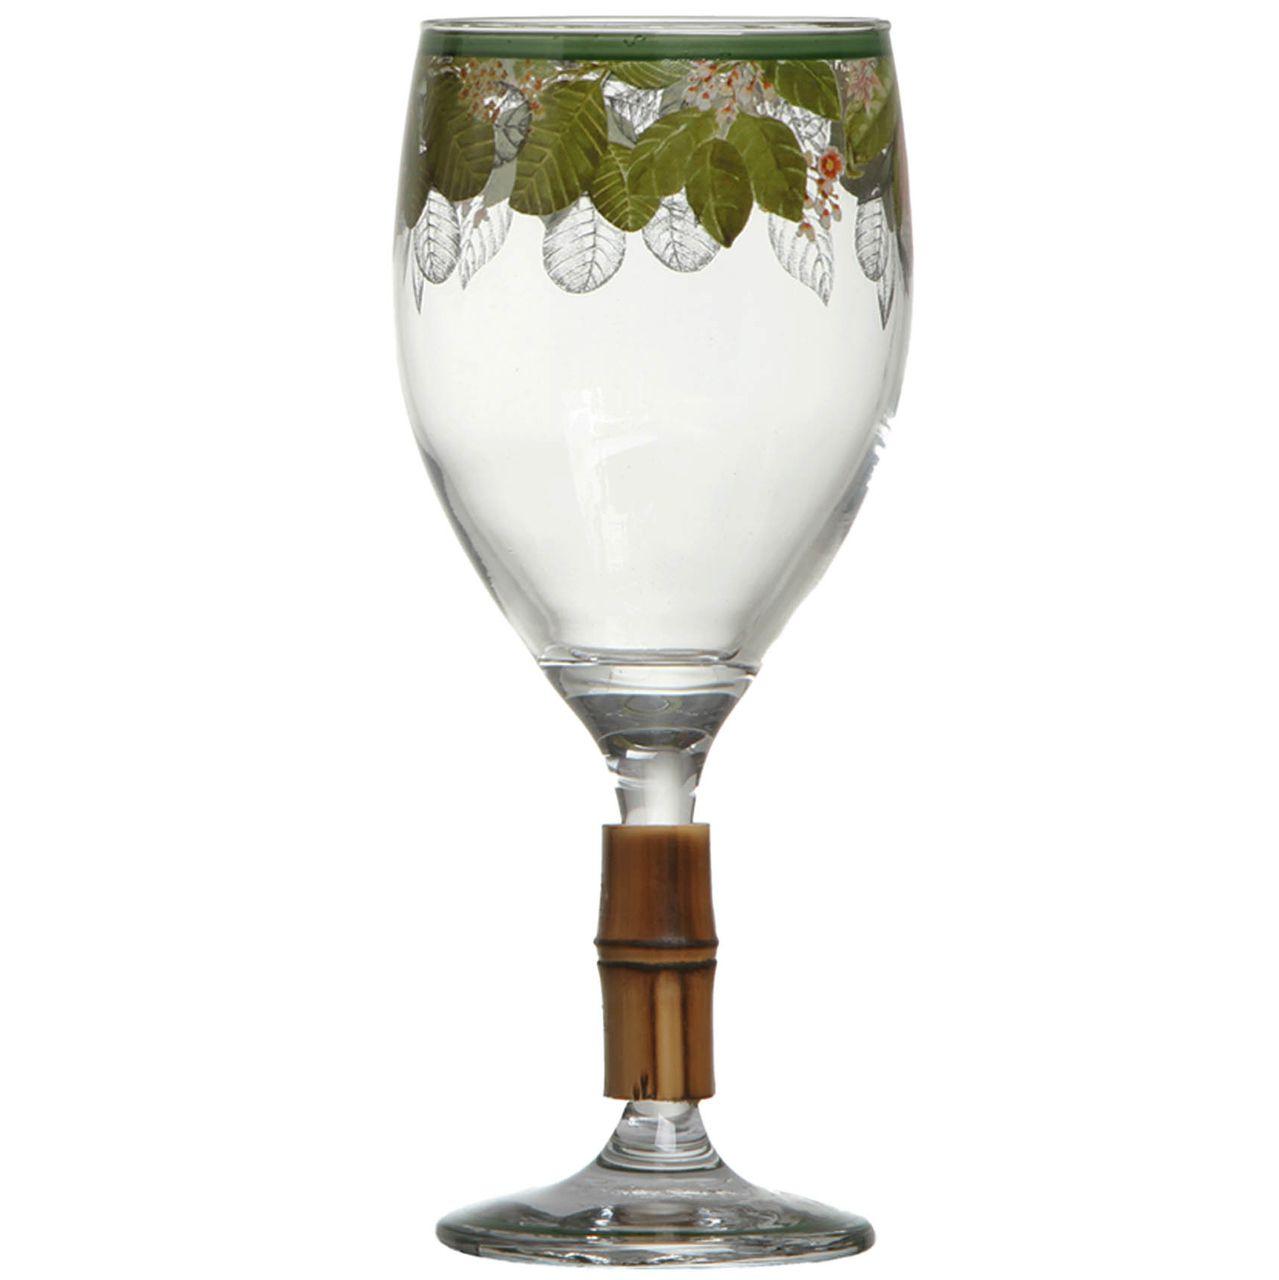 Taça de Vinho c/ Bambu Nostri Frutti (06 Unidades) Cód.: 3852 - MB